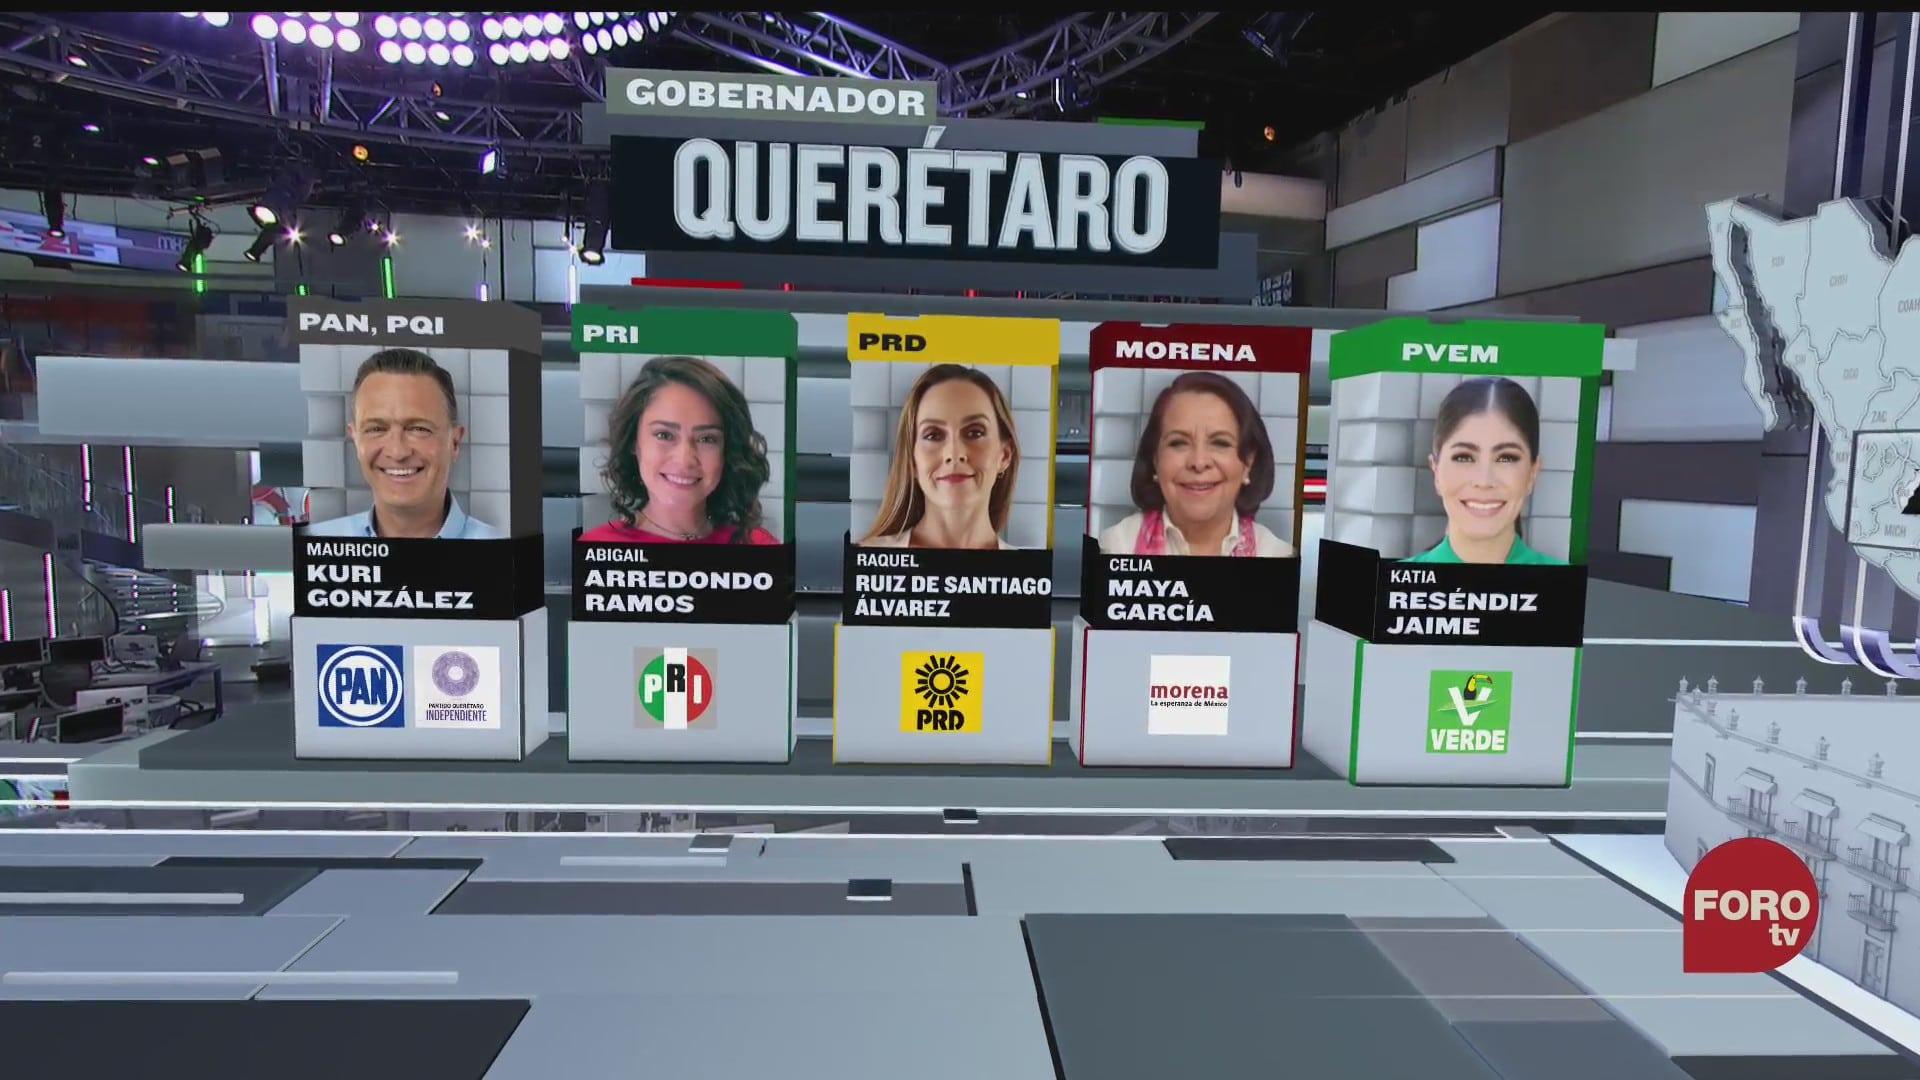 diez candidatos compiten por la gubernatura de queretaro